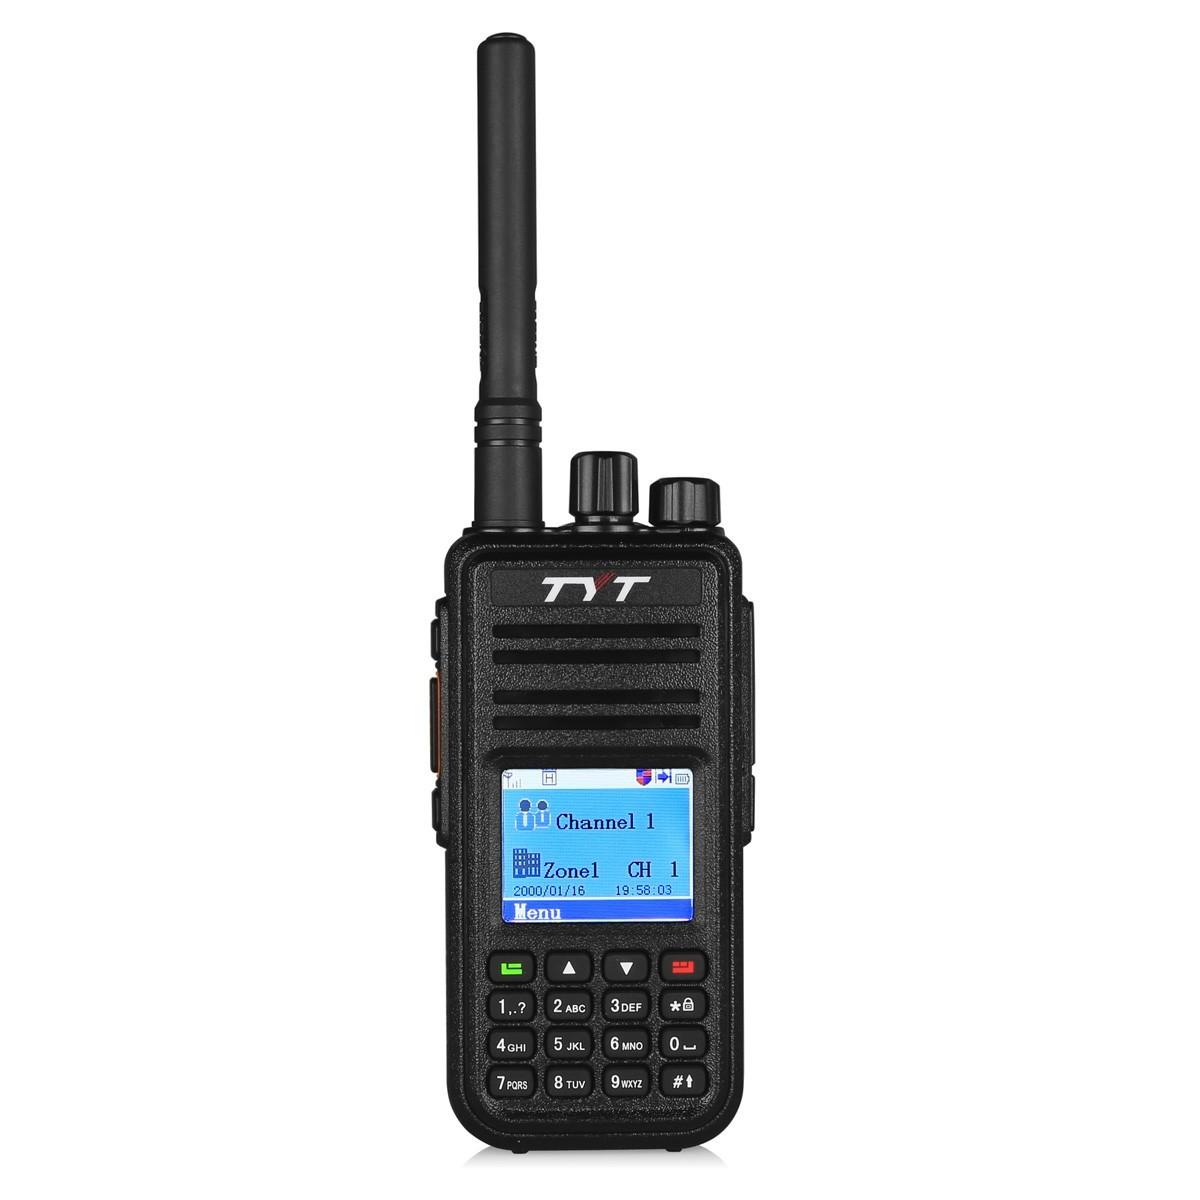 digitalk walkie talkie instructions